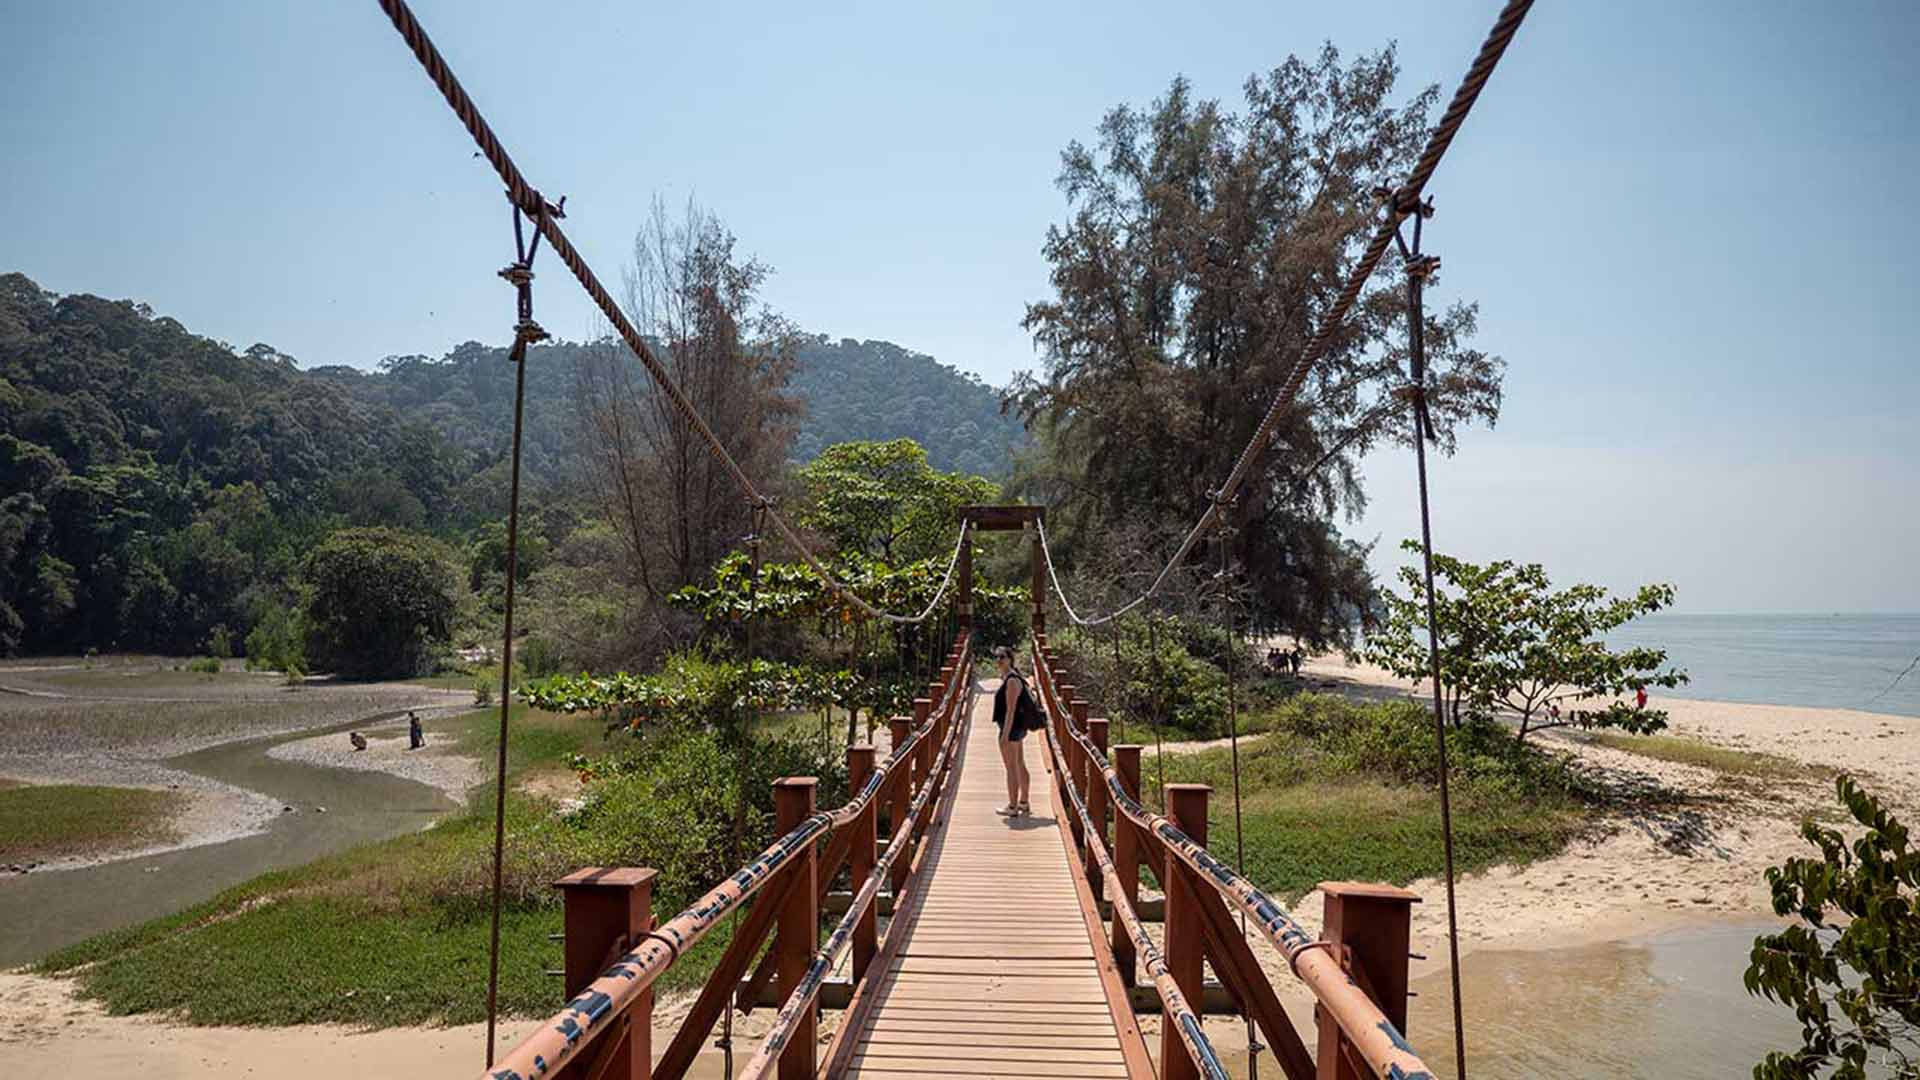 Penang Nationalpark: Das kleinste Dschungelabenteuer der Welt!